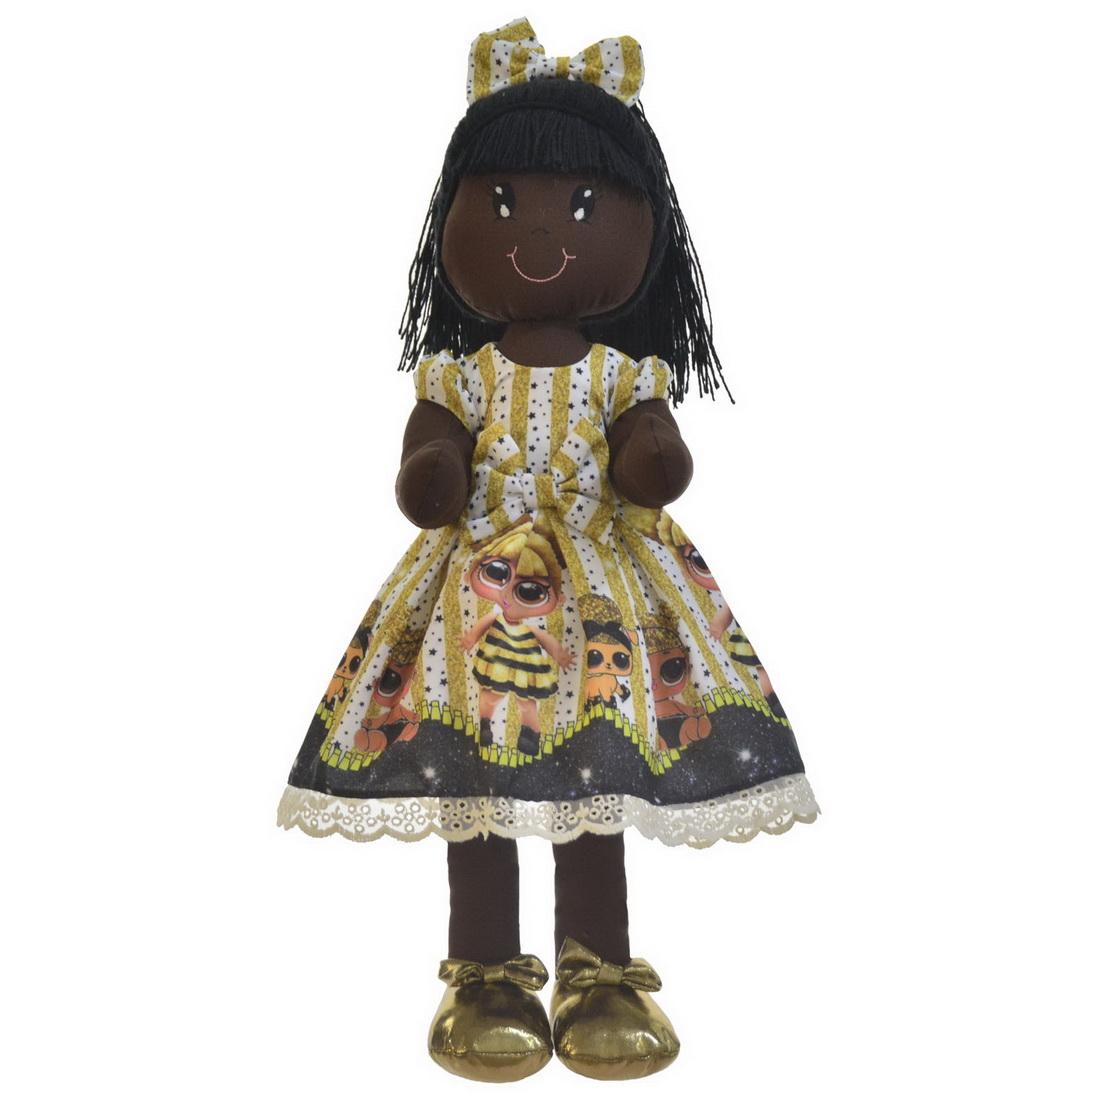 Boneca de Pano Nina com Roupa tema Queen bee - Negra